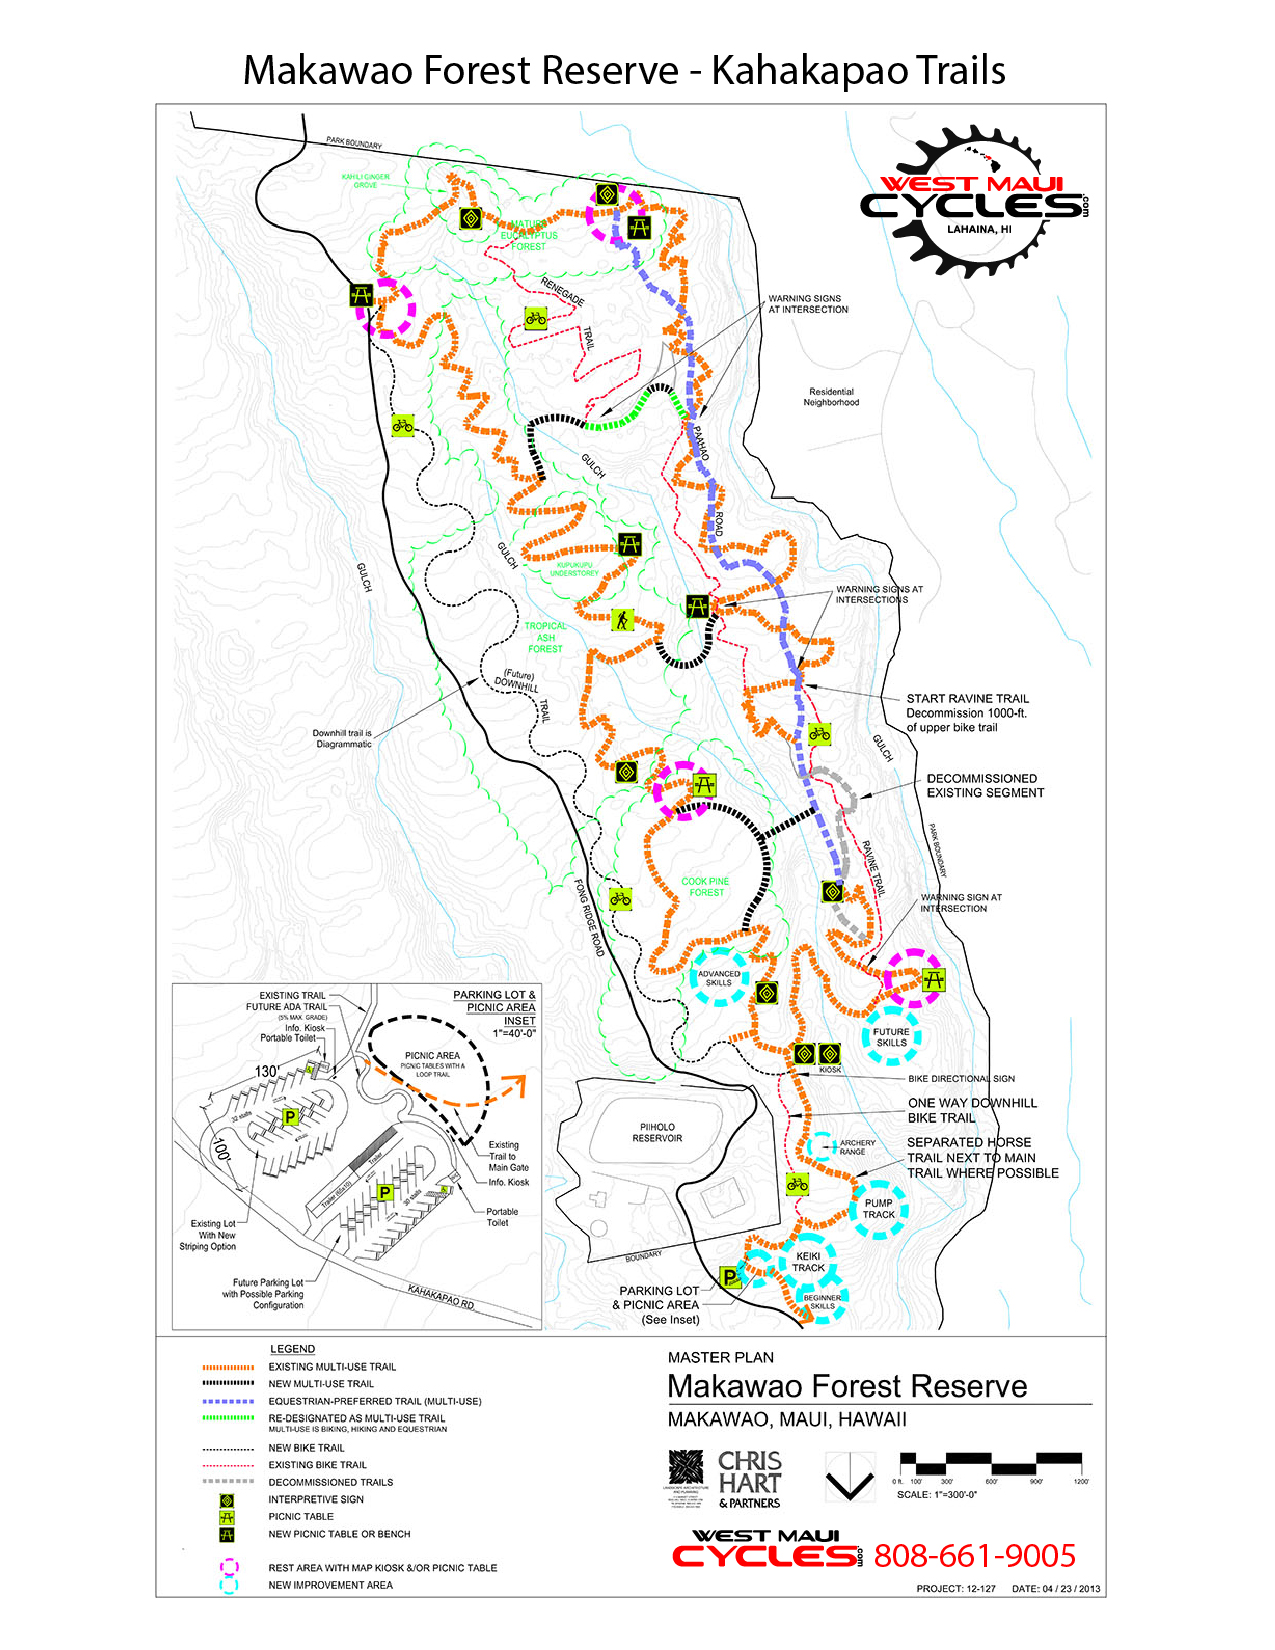 Makawao Forest Reserve - Kahakapao Trail system